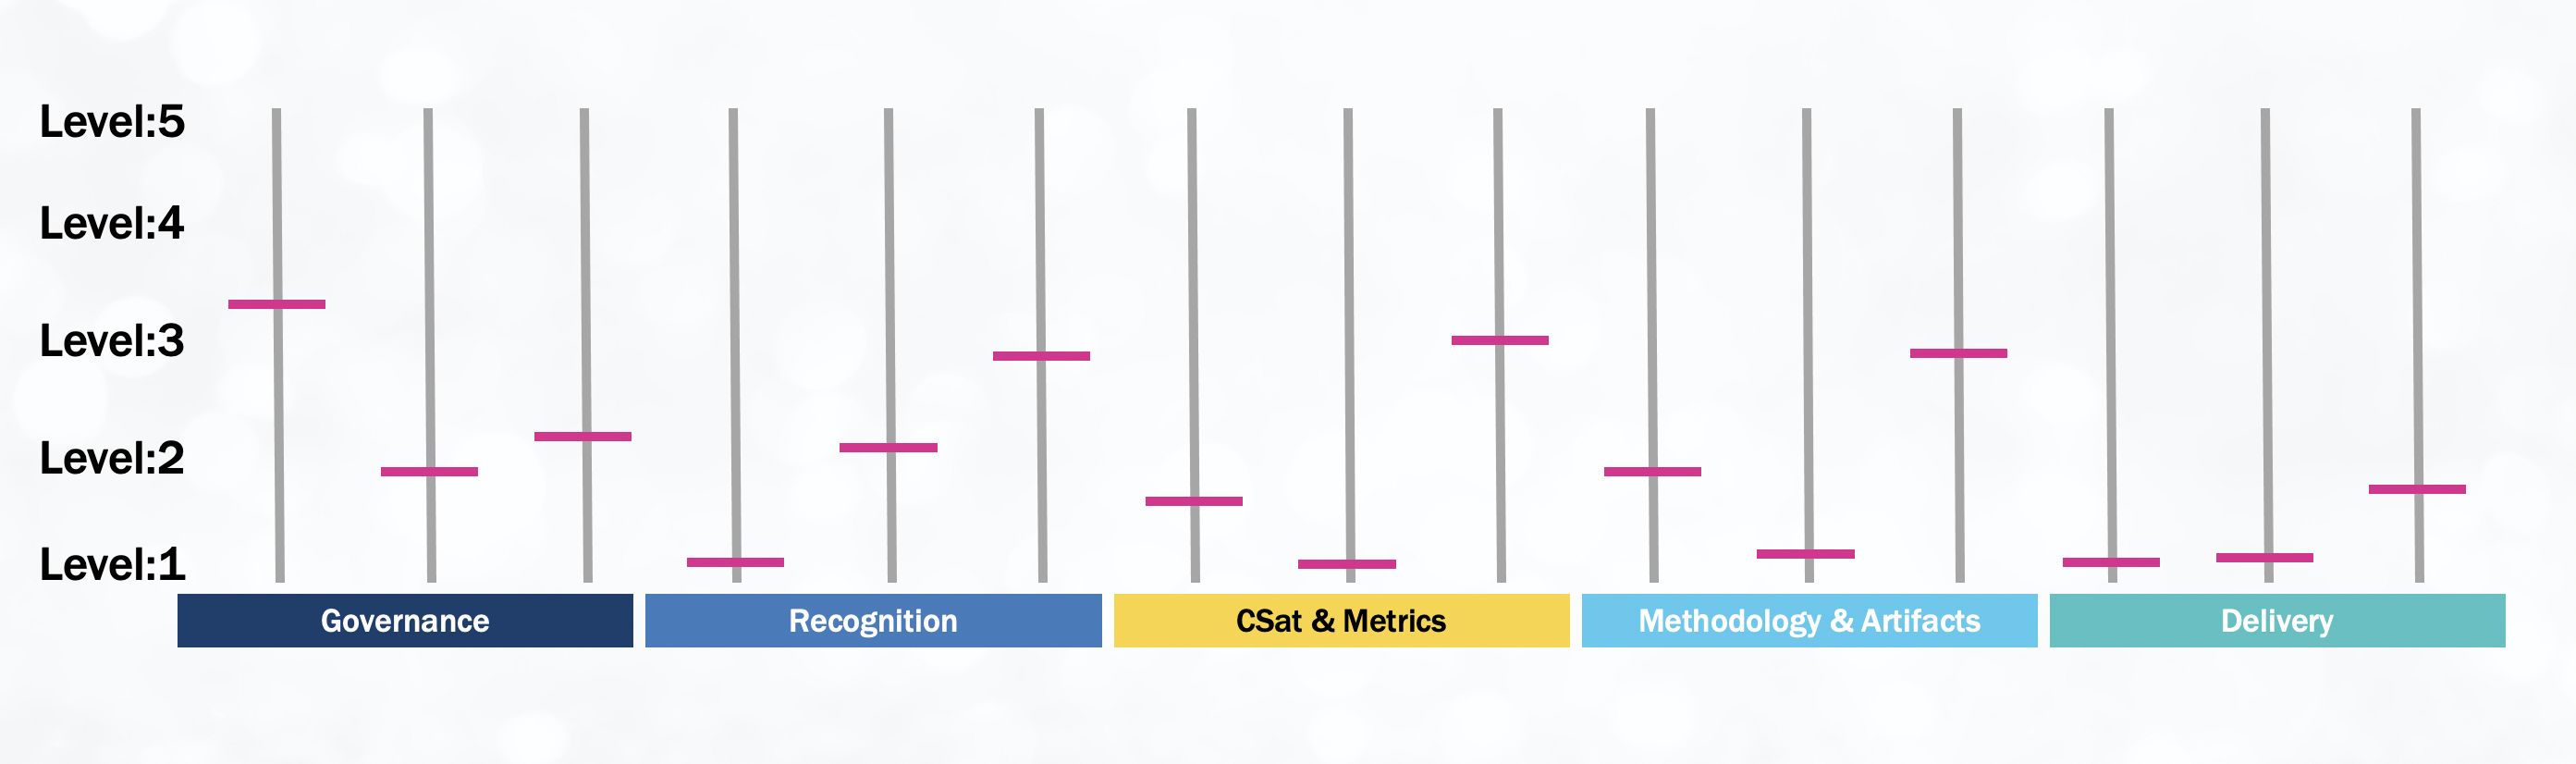 Customer Experience Maturity Assessment